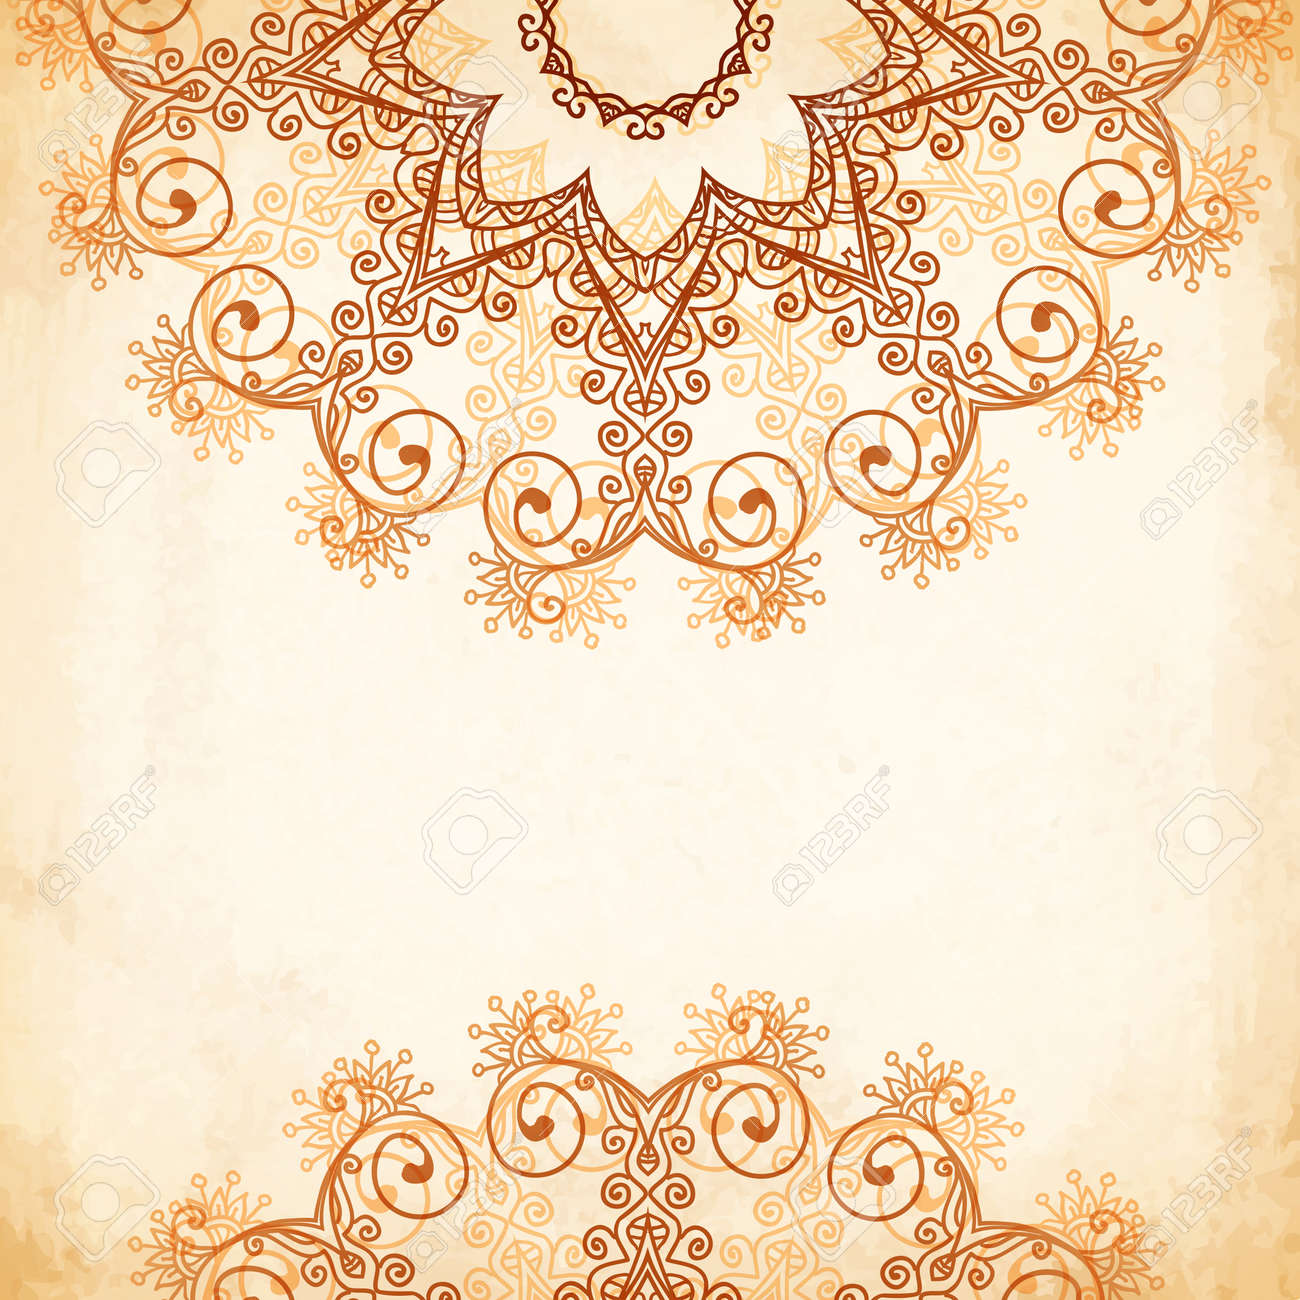 Ornate vintage vector background in mehndi style royalty free stock - Ornate Vintage Circle Vector Seamless Pattern In Mehndi Style Stock Vector 25740675